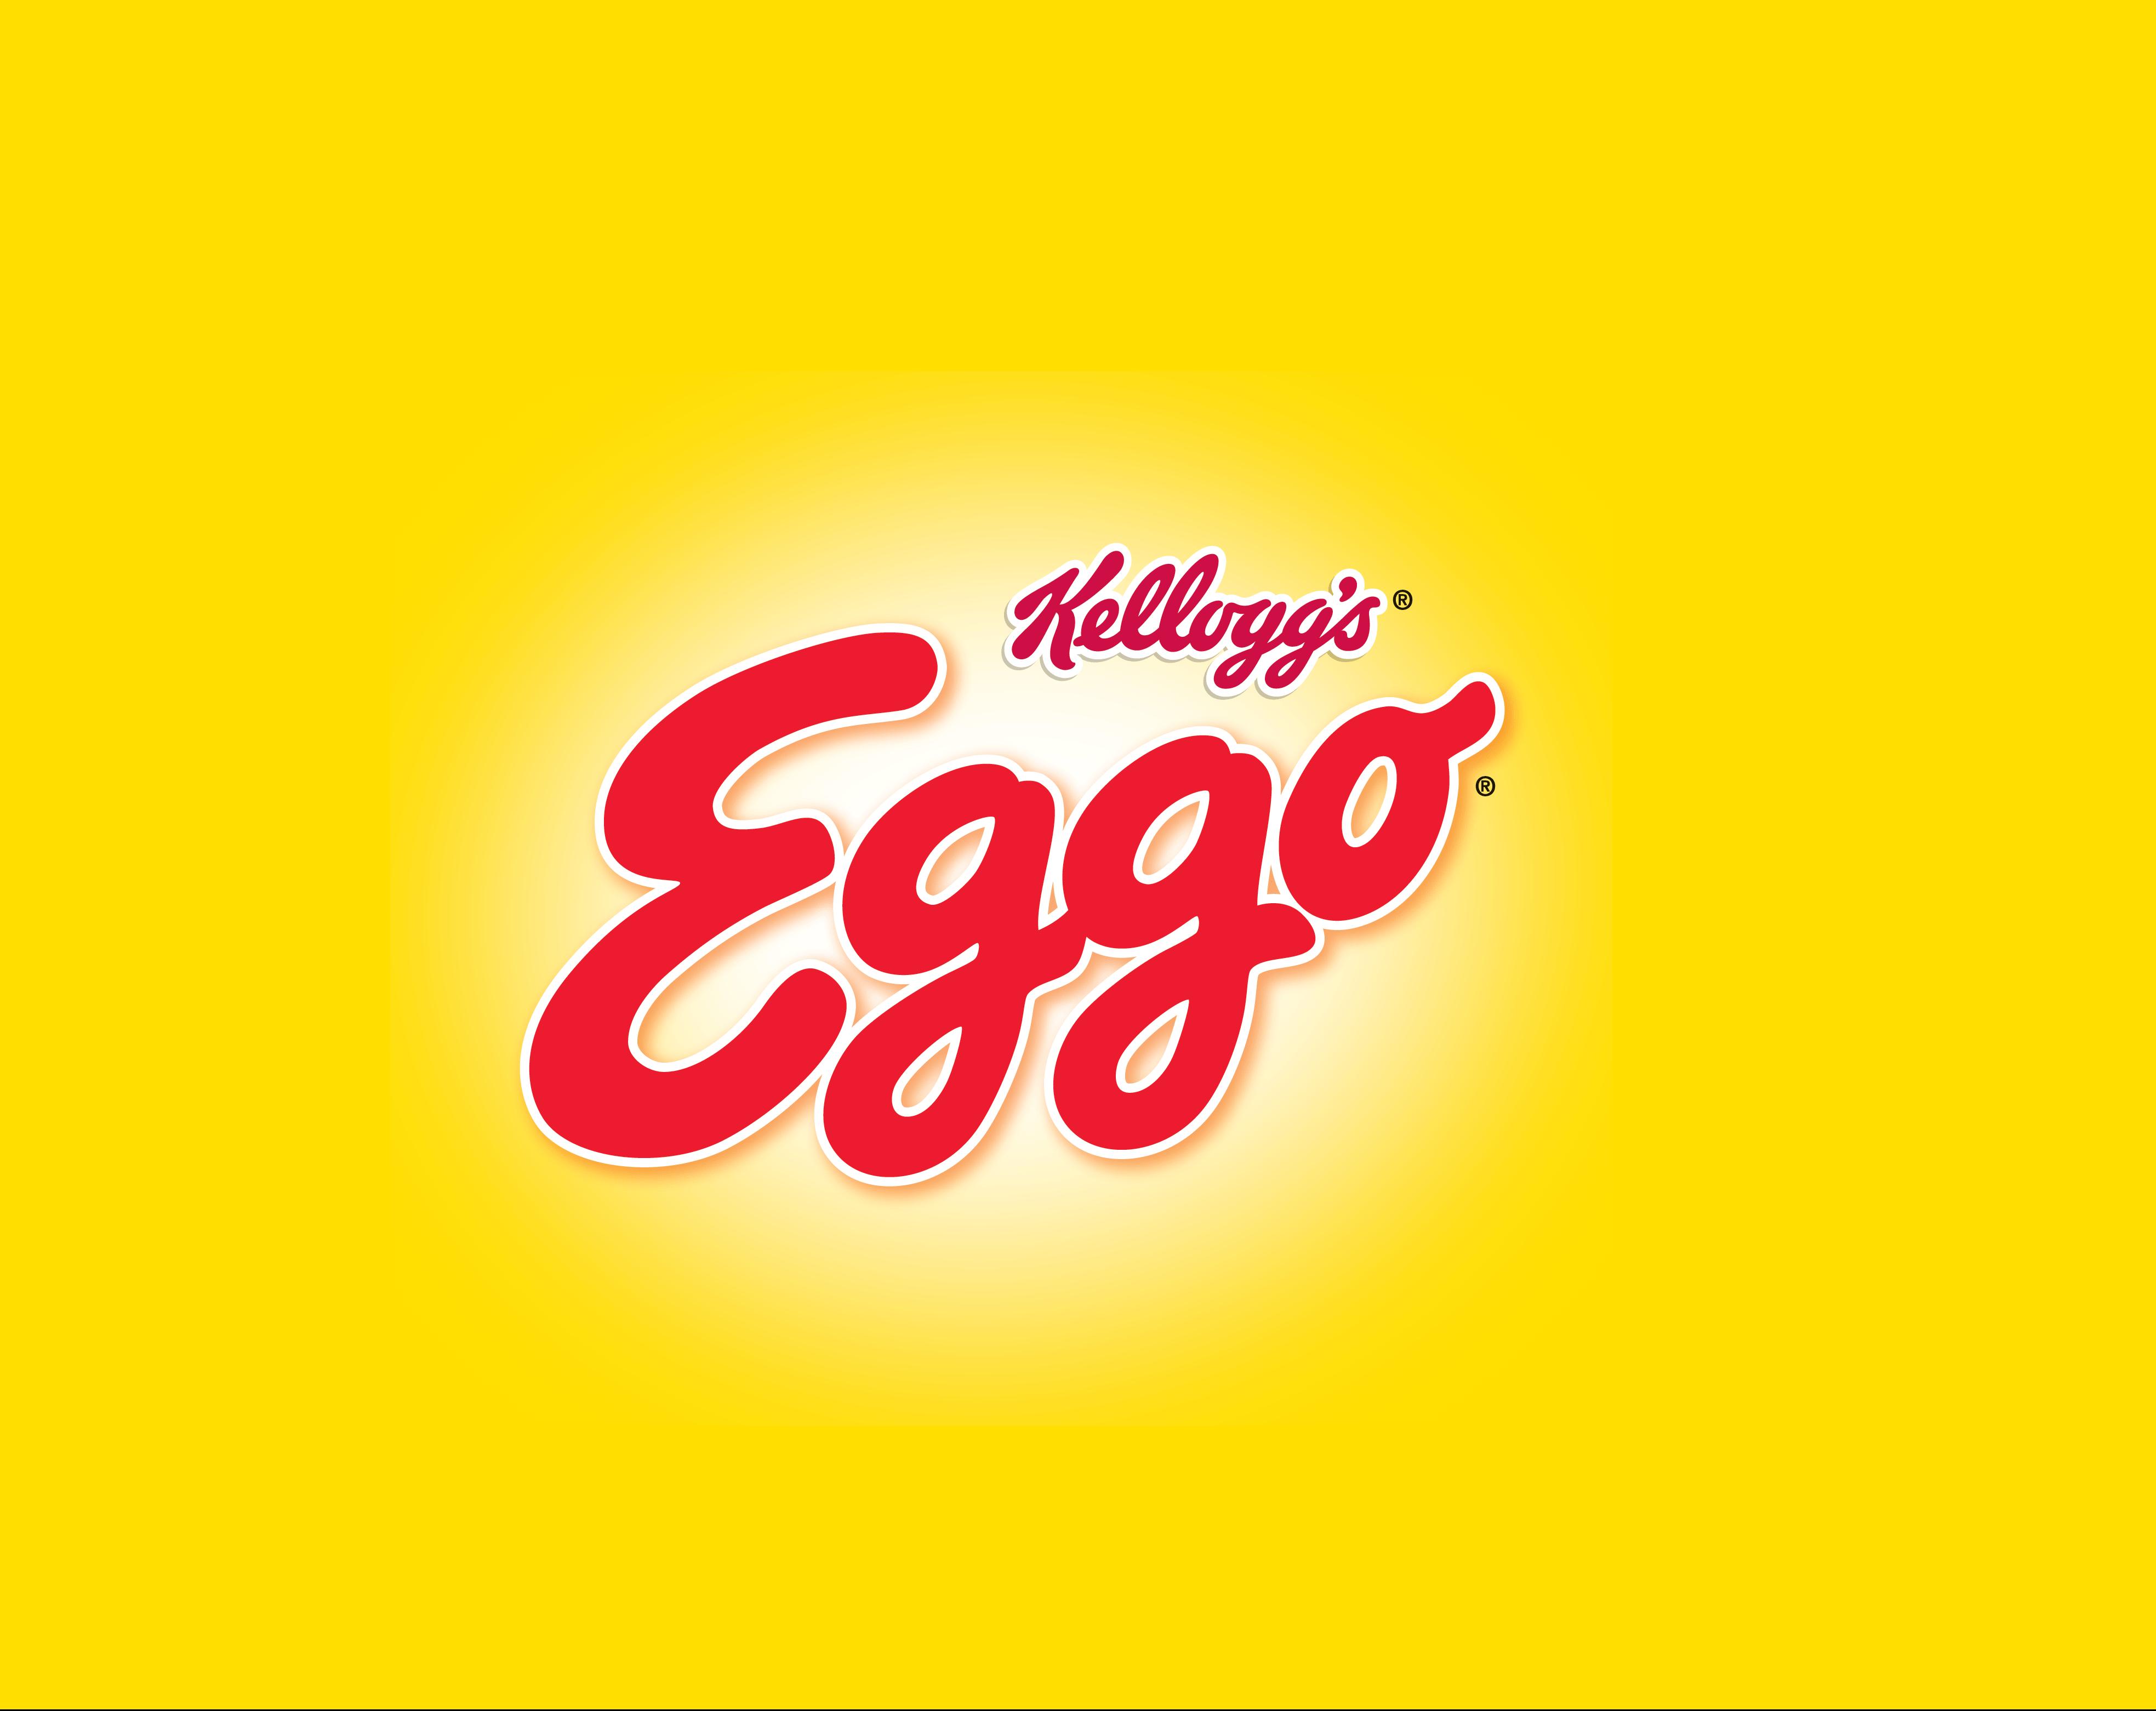 Kelloggs Eggo Logo 2020